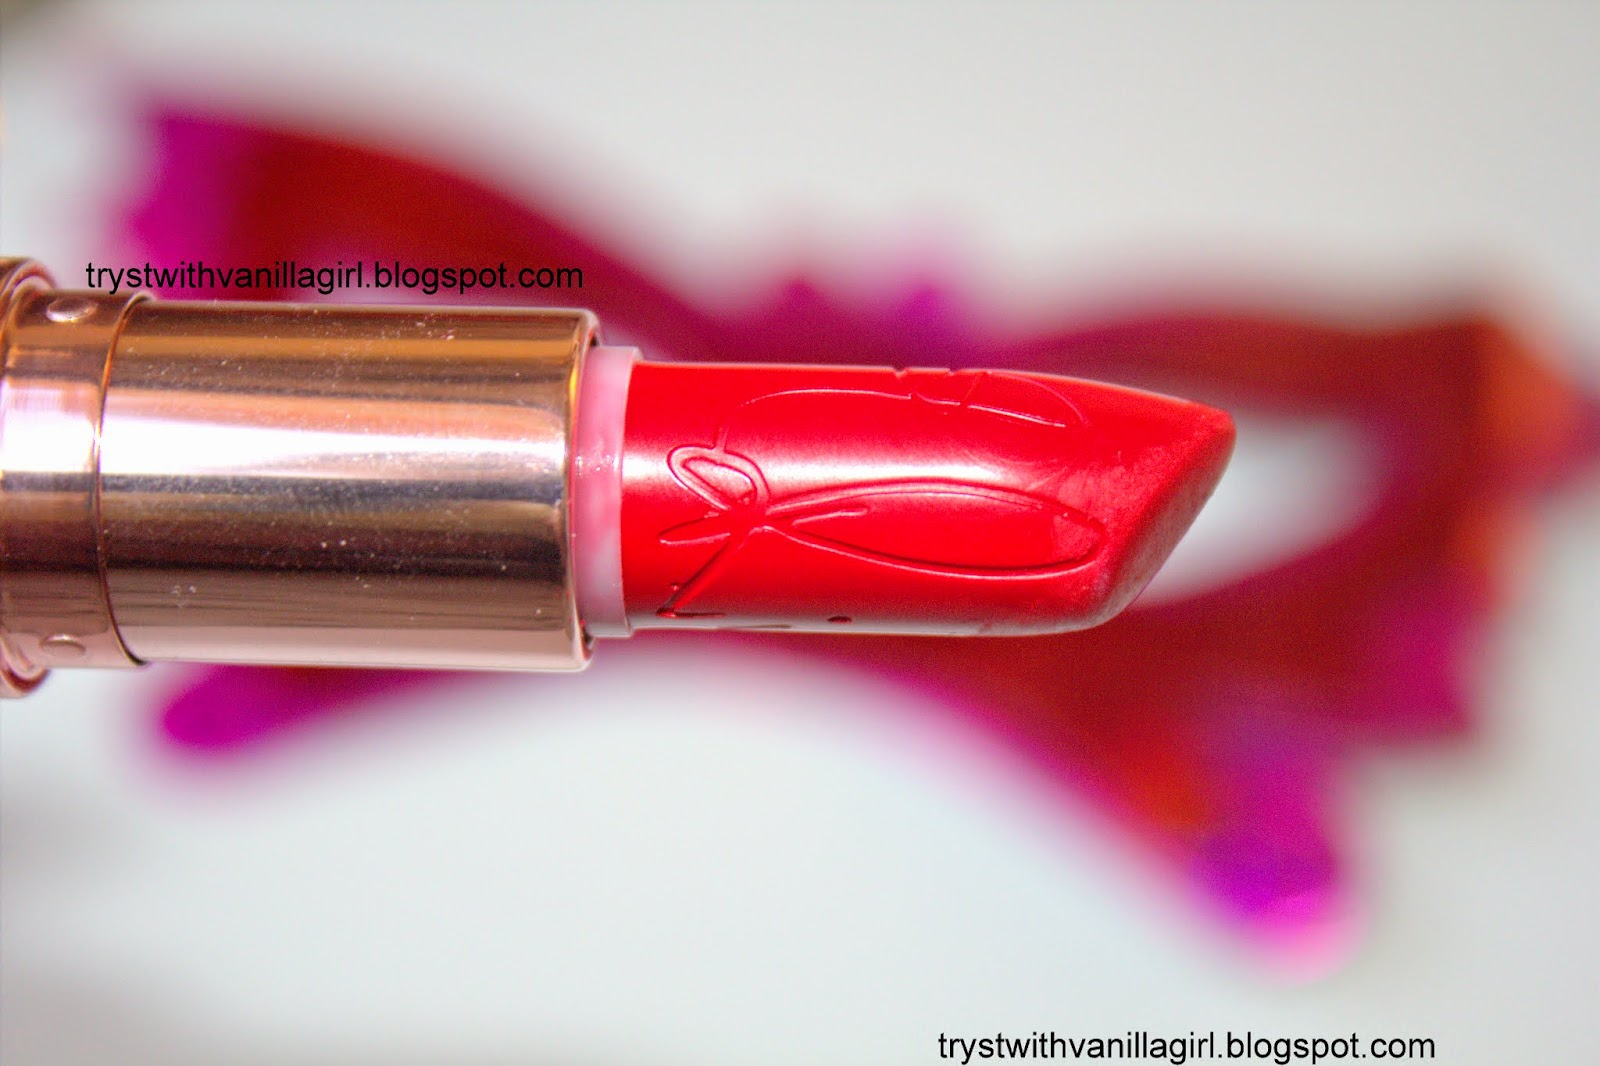 rubywoo,mac lipsticks,indian beauty blog